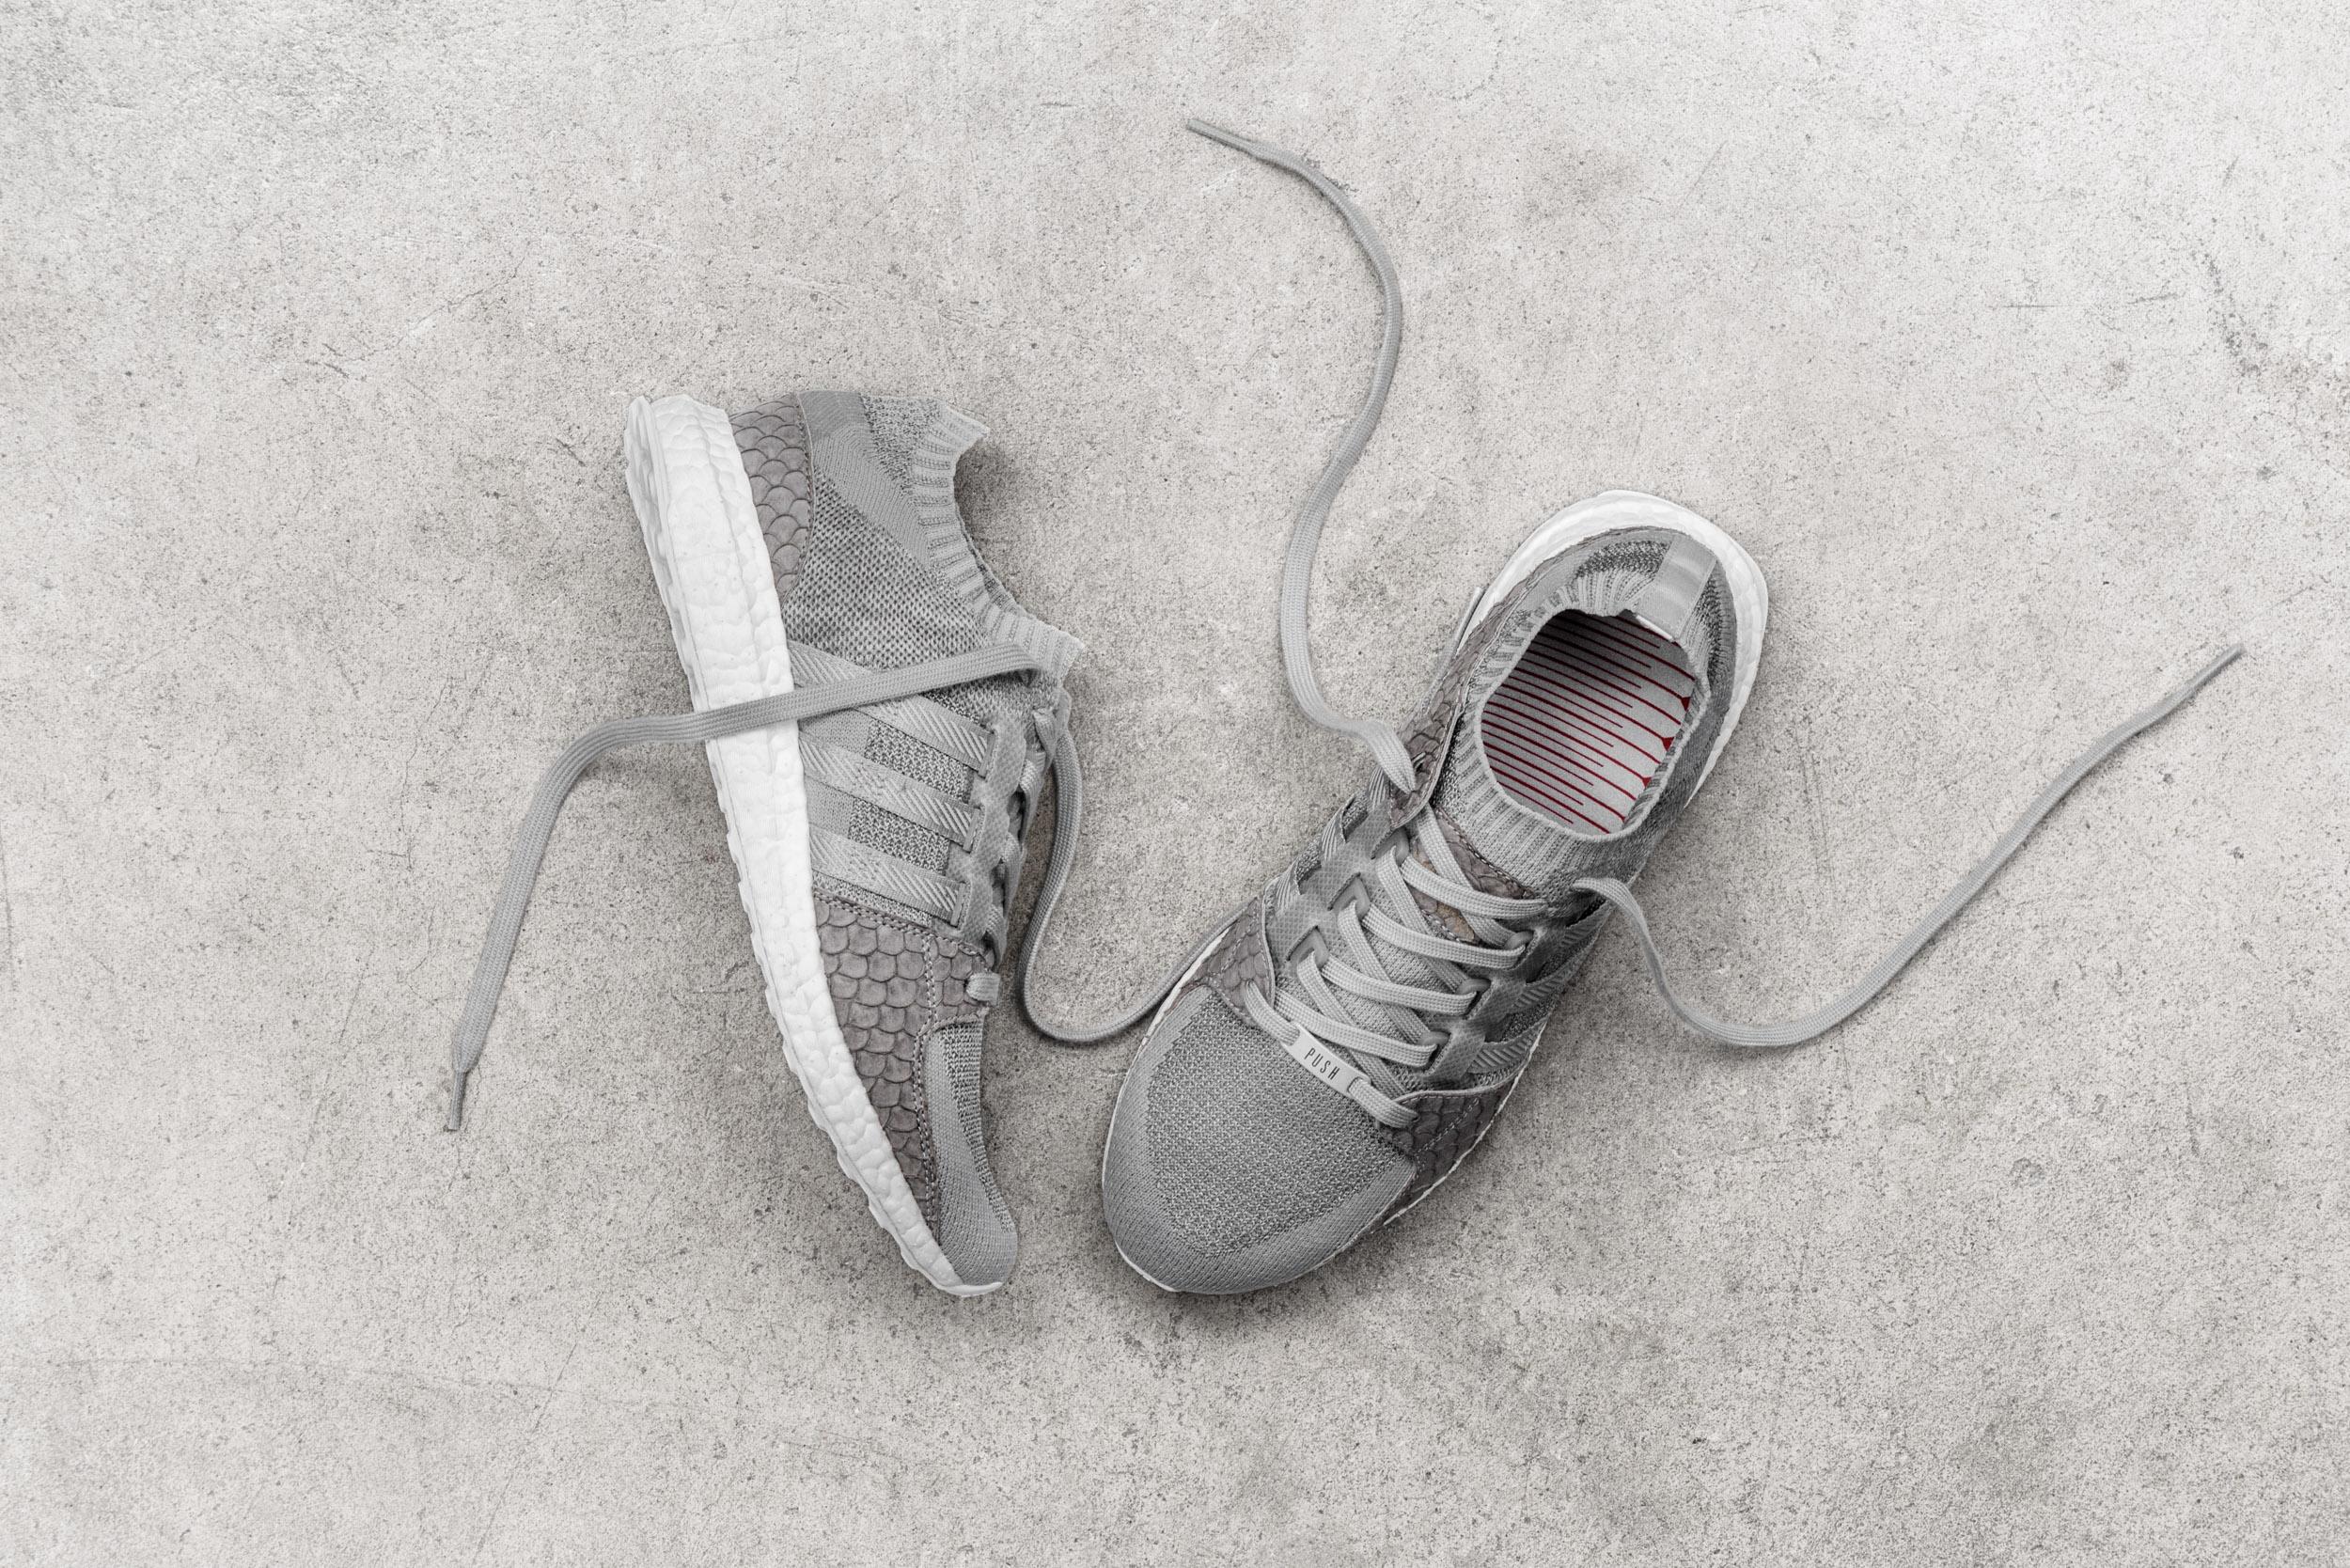 adidas King Push EQT Greyscale S76777 2